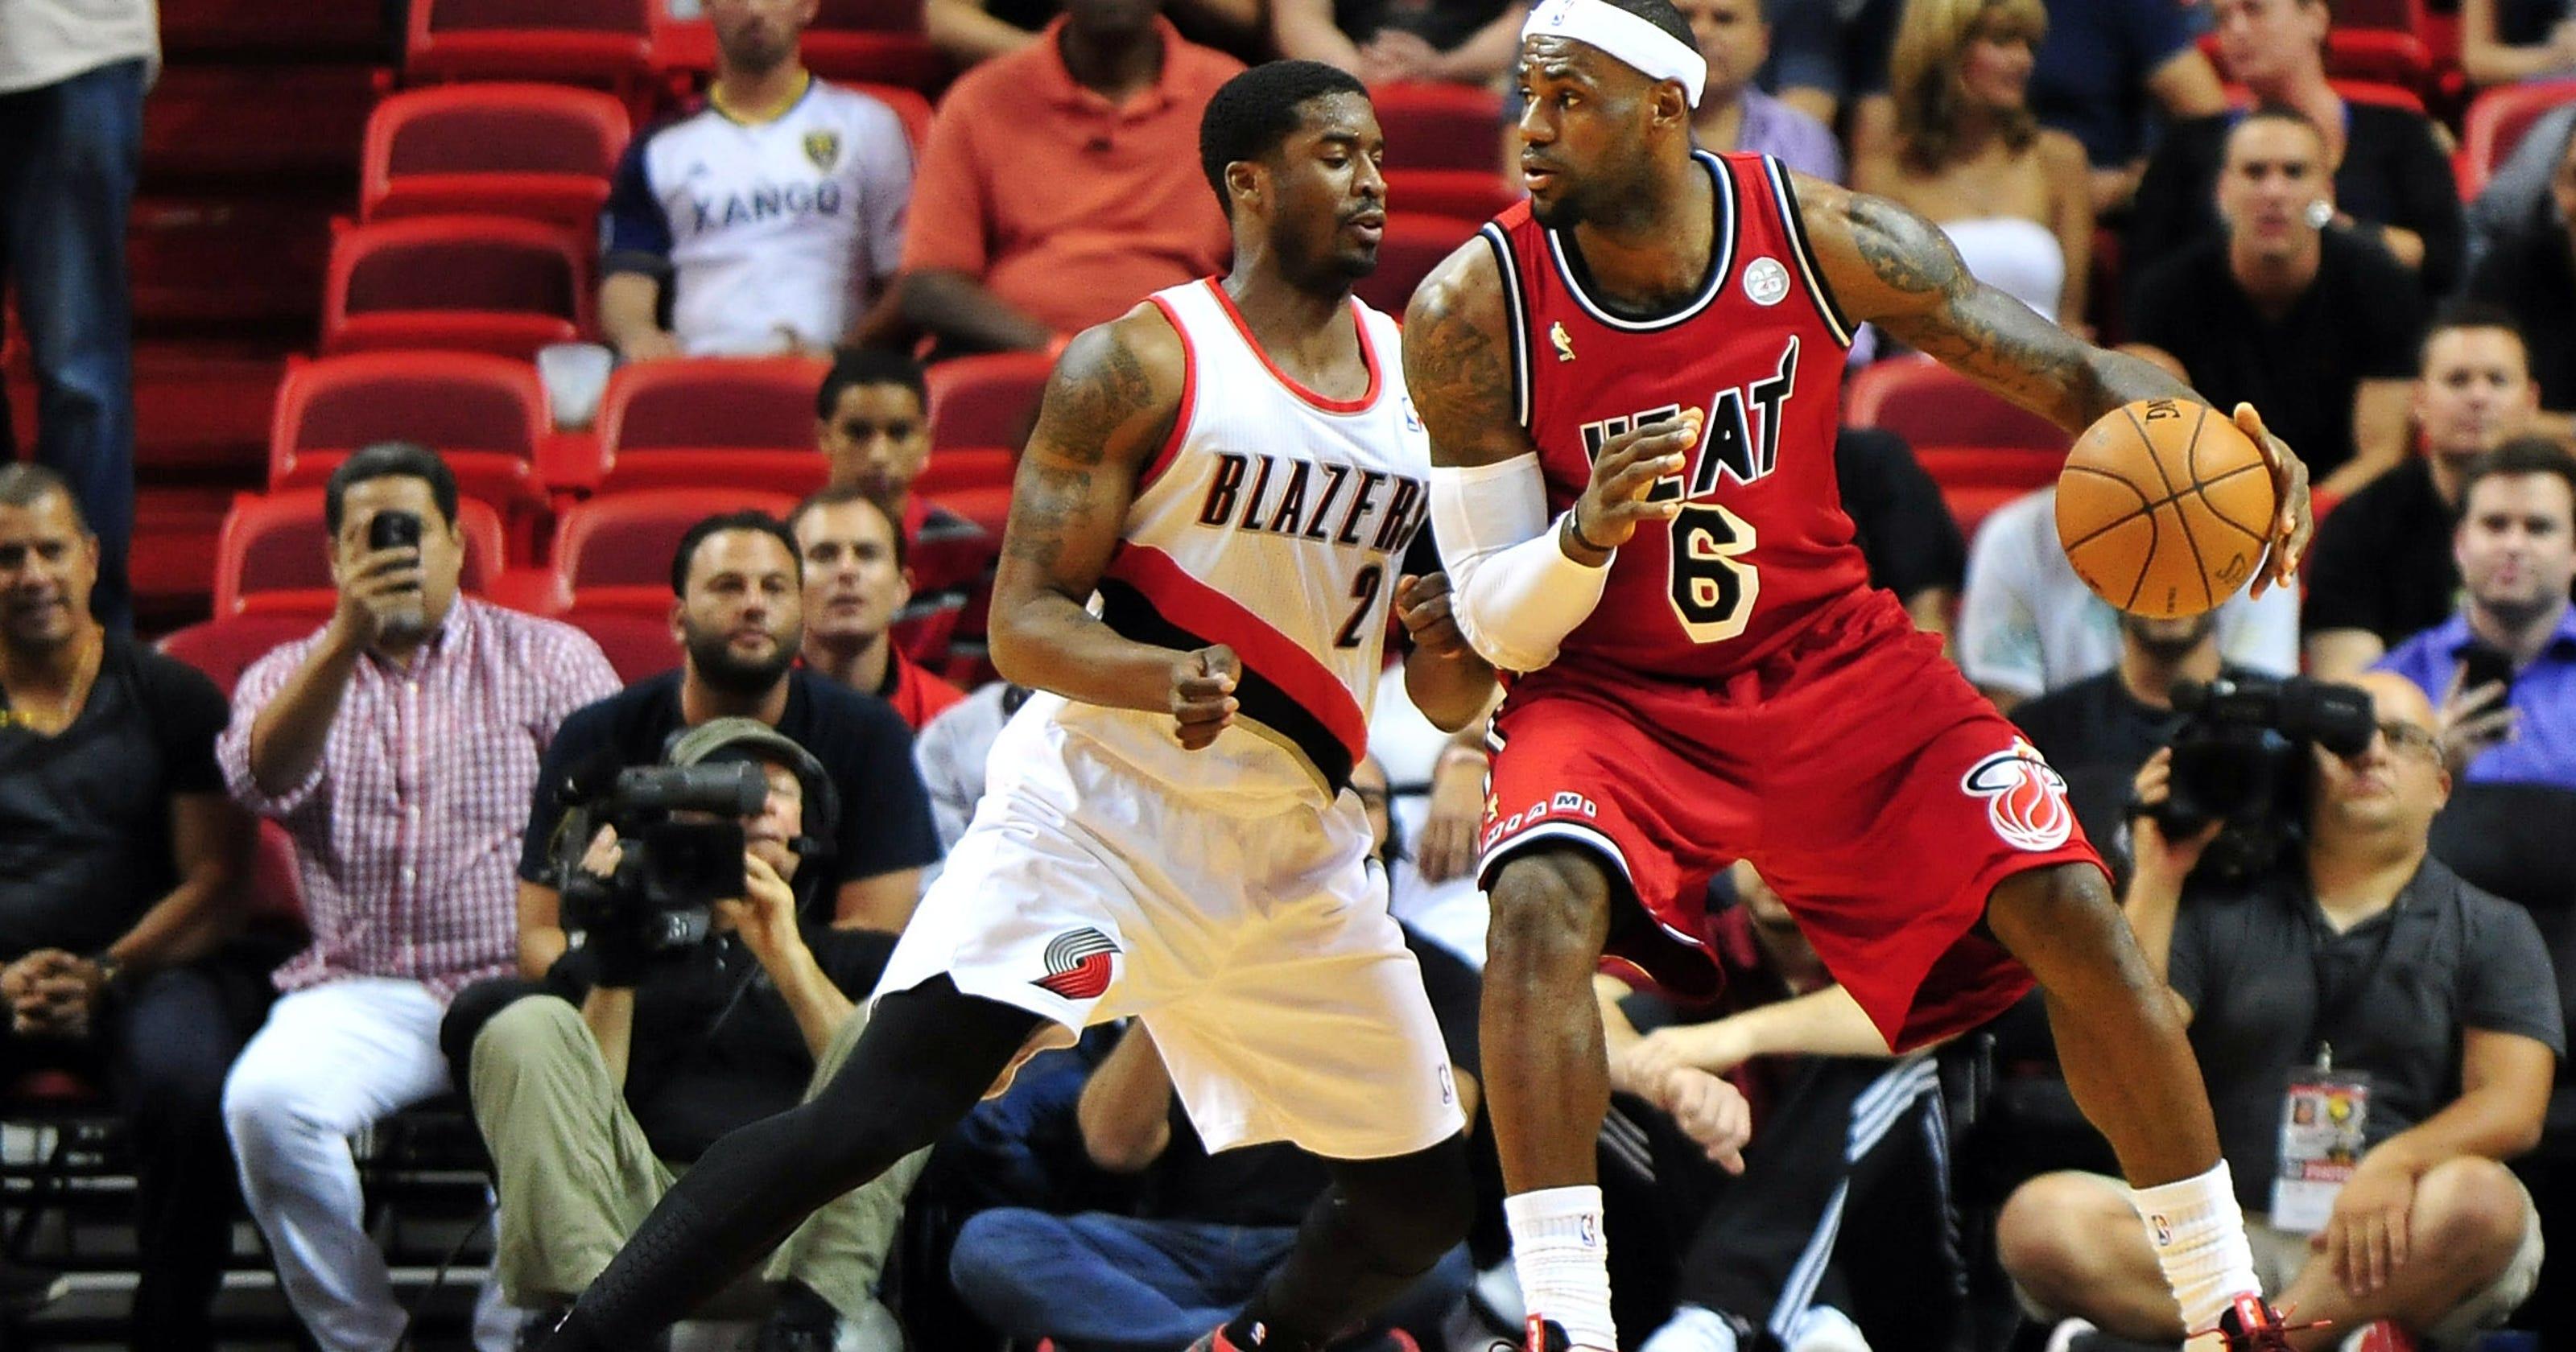 f48068edcd8 LeBron James sets record in hot streak